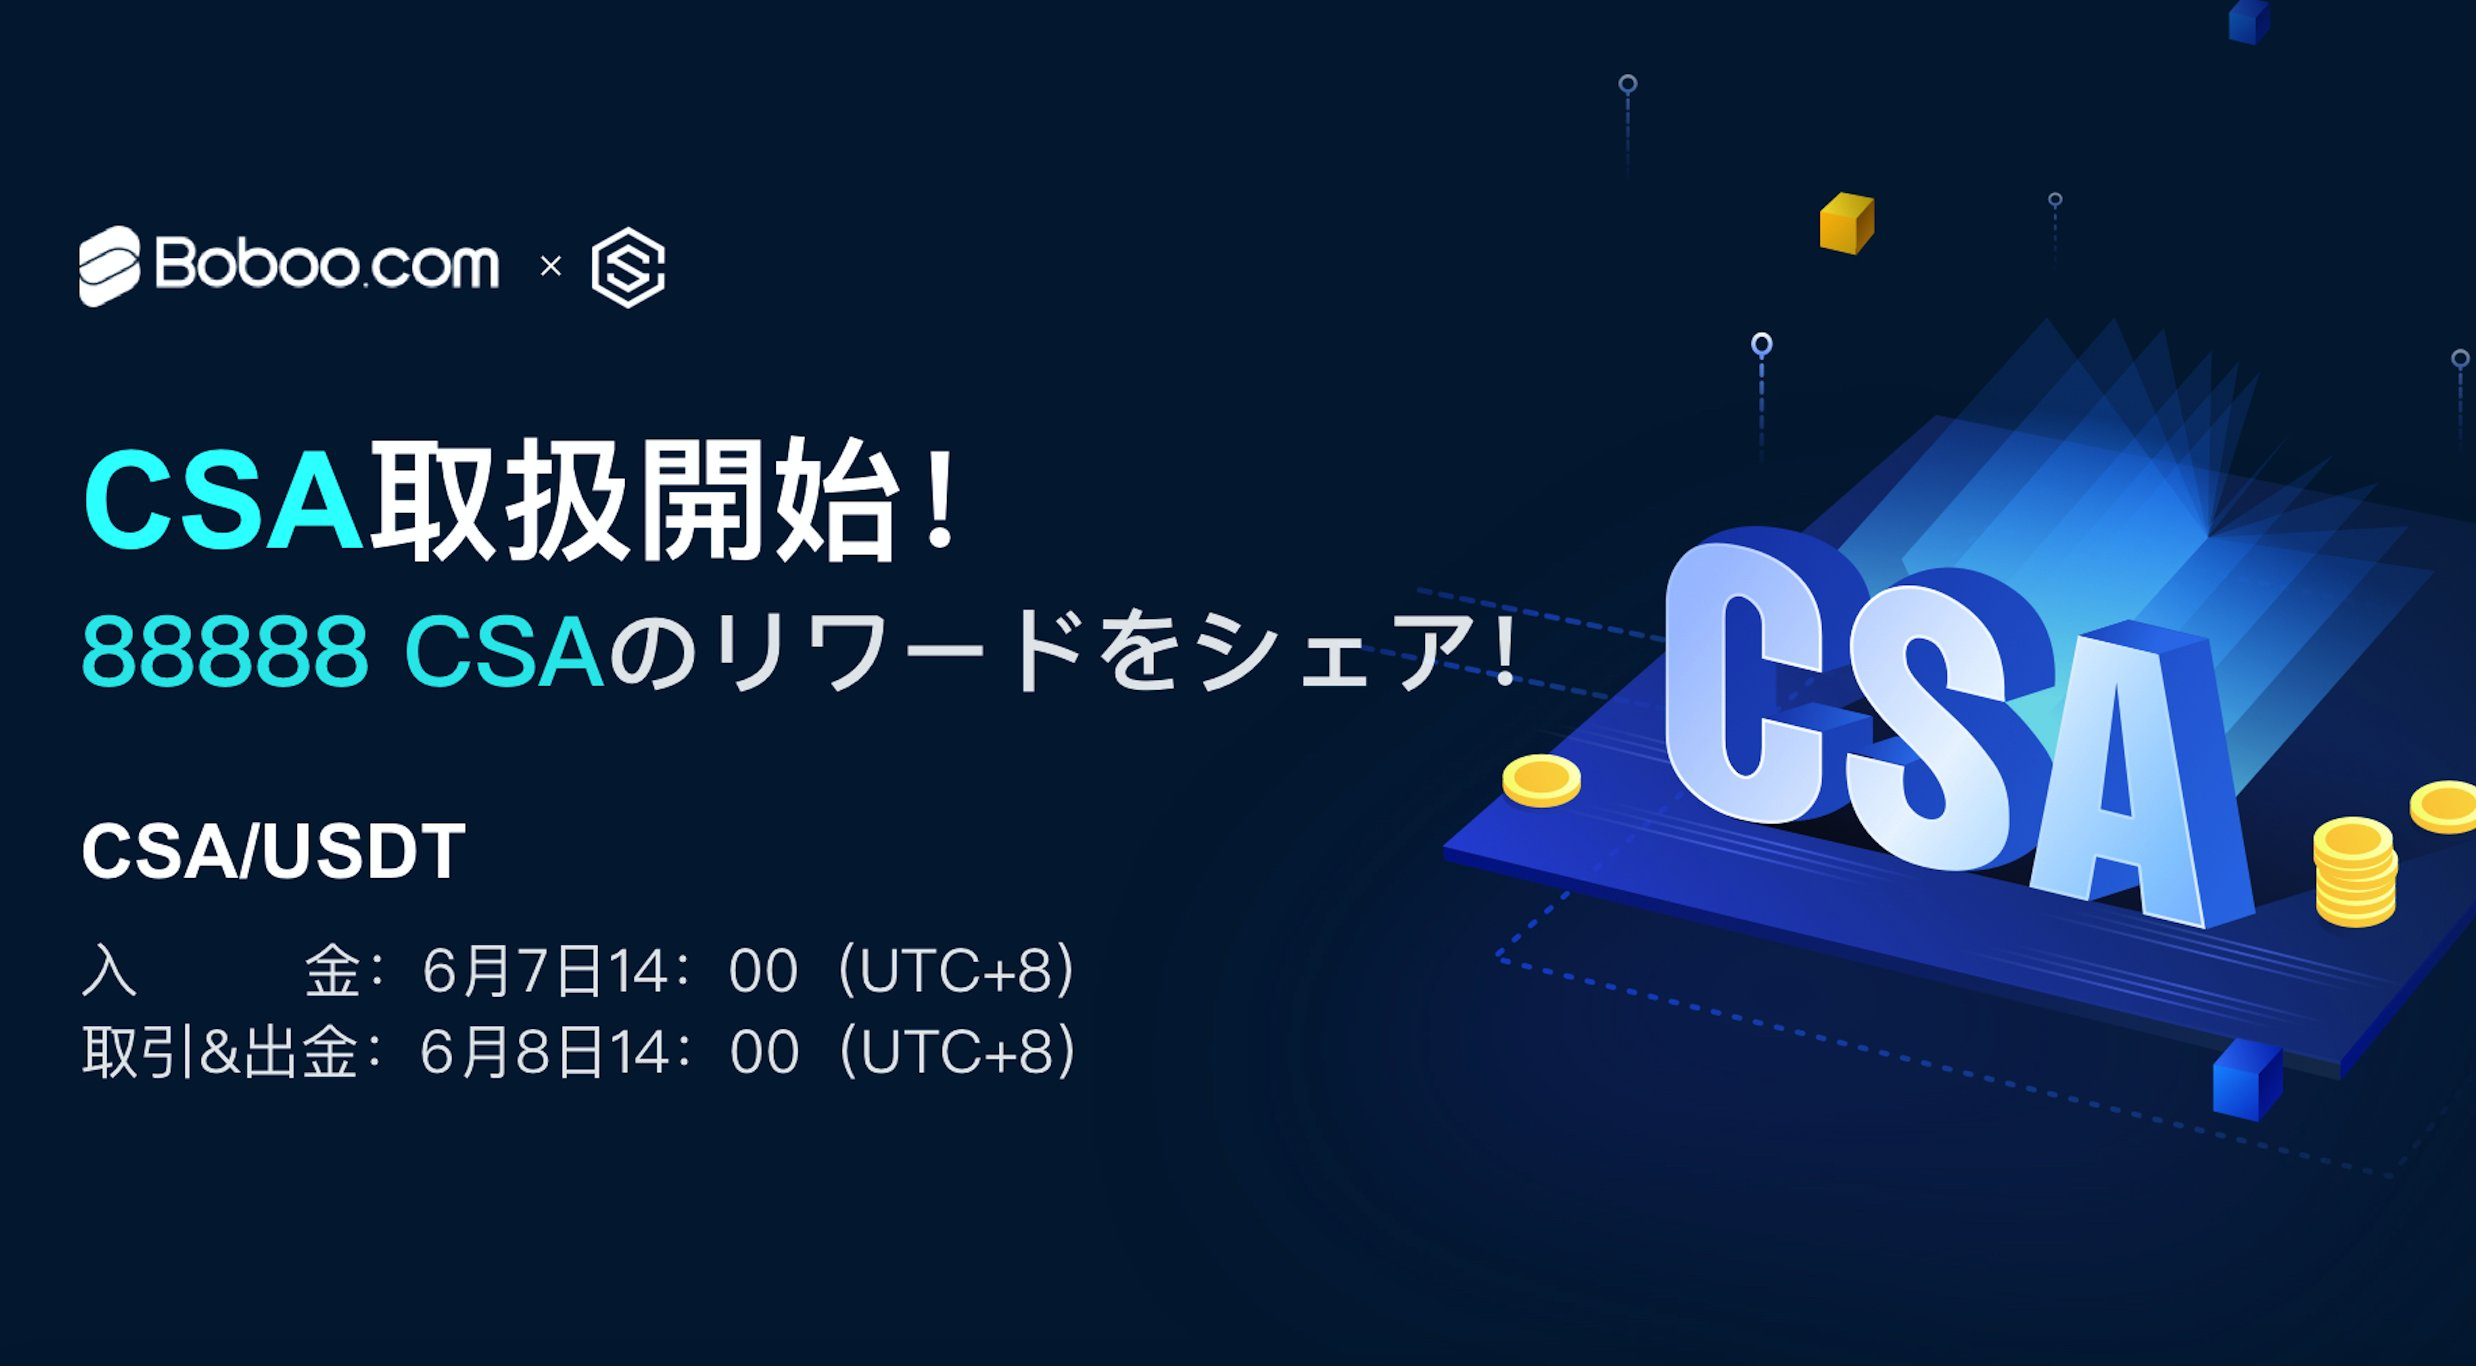 「Boboo」CSA取扱開始記念イベント開催! 88888CSAのリワードをシェア!